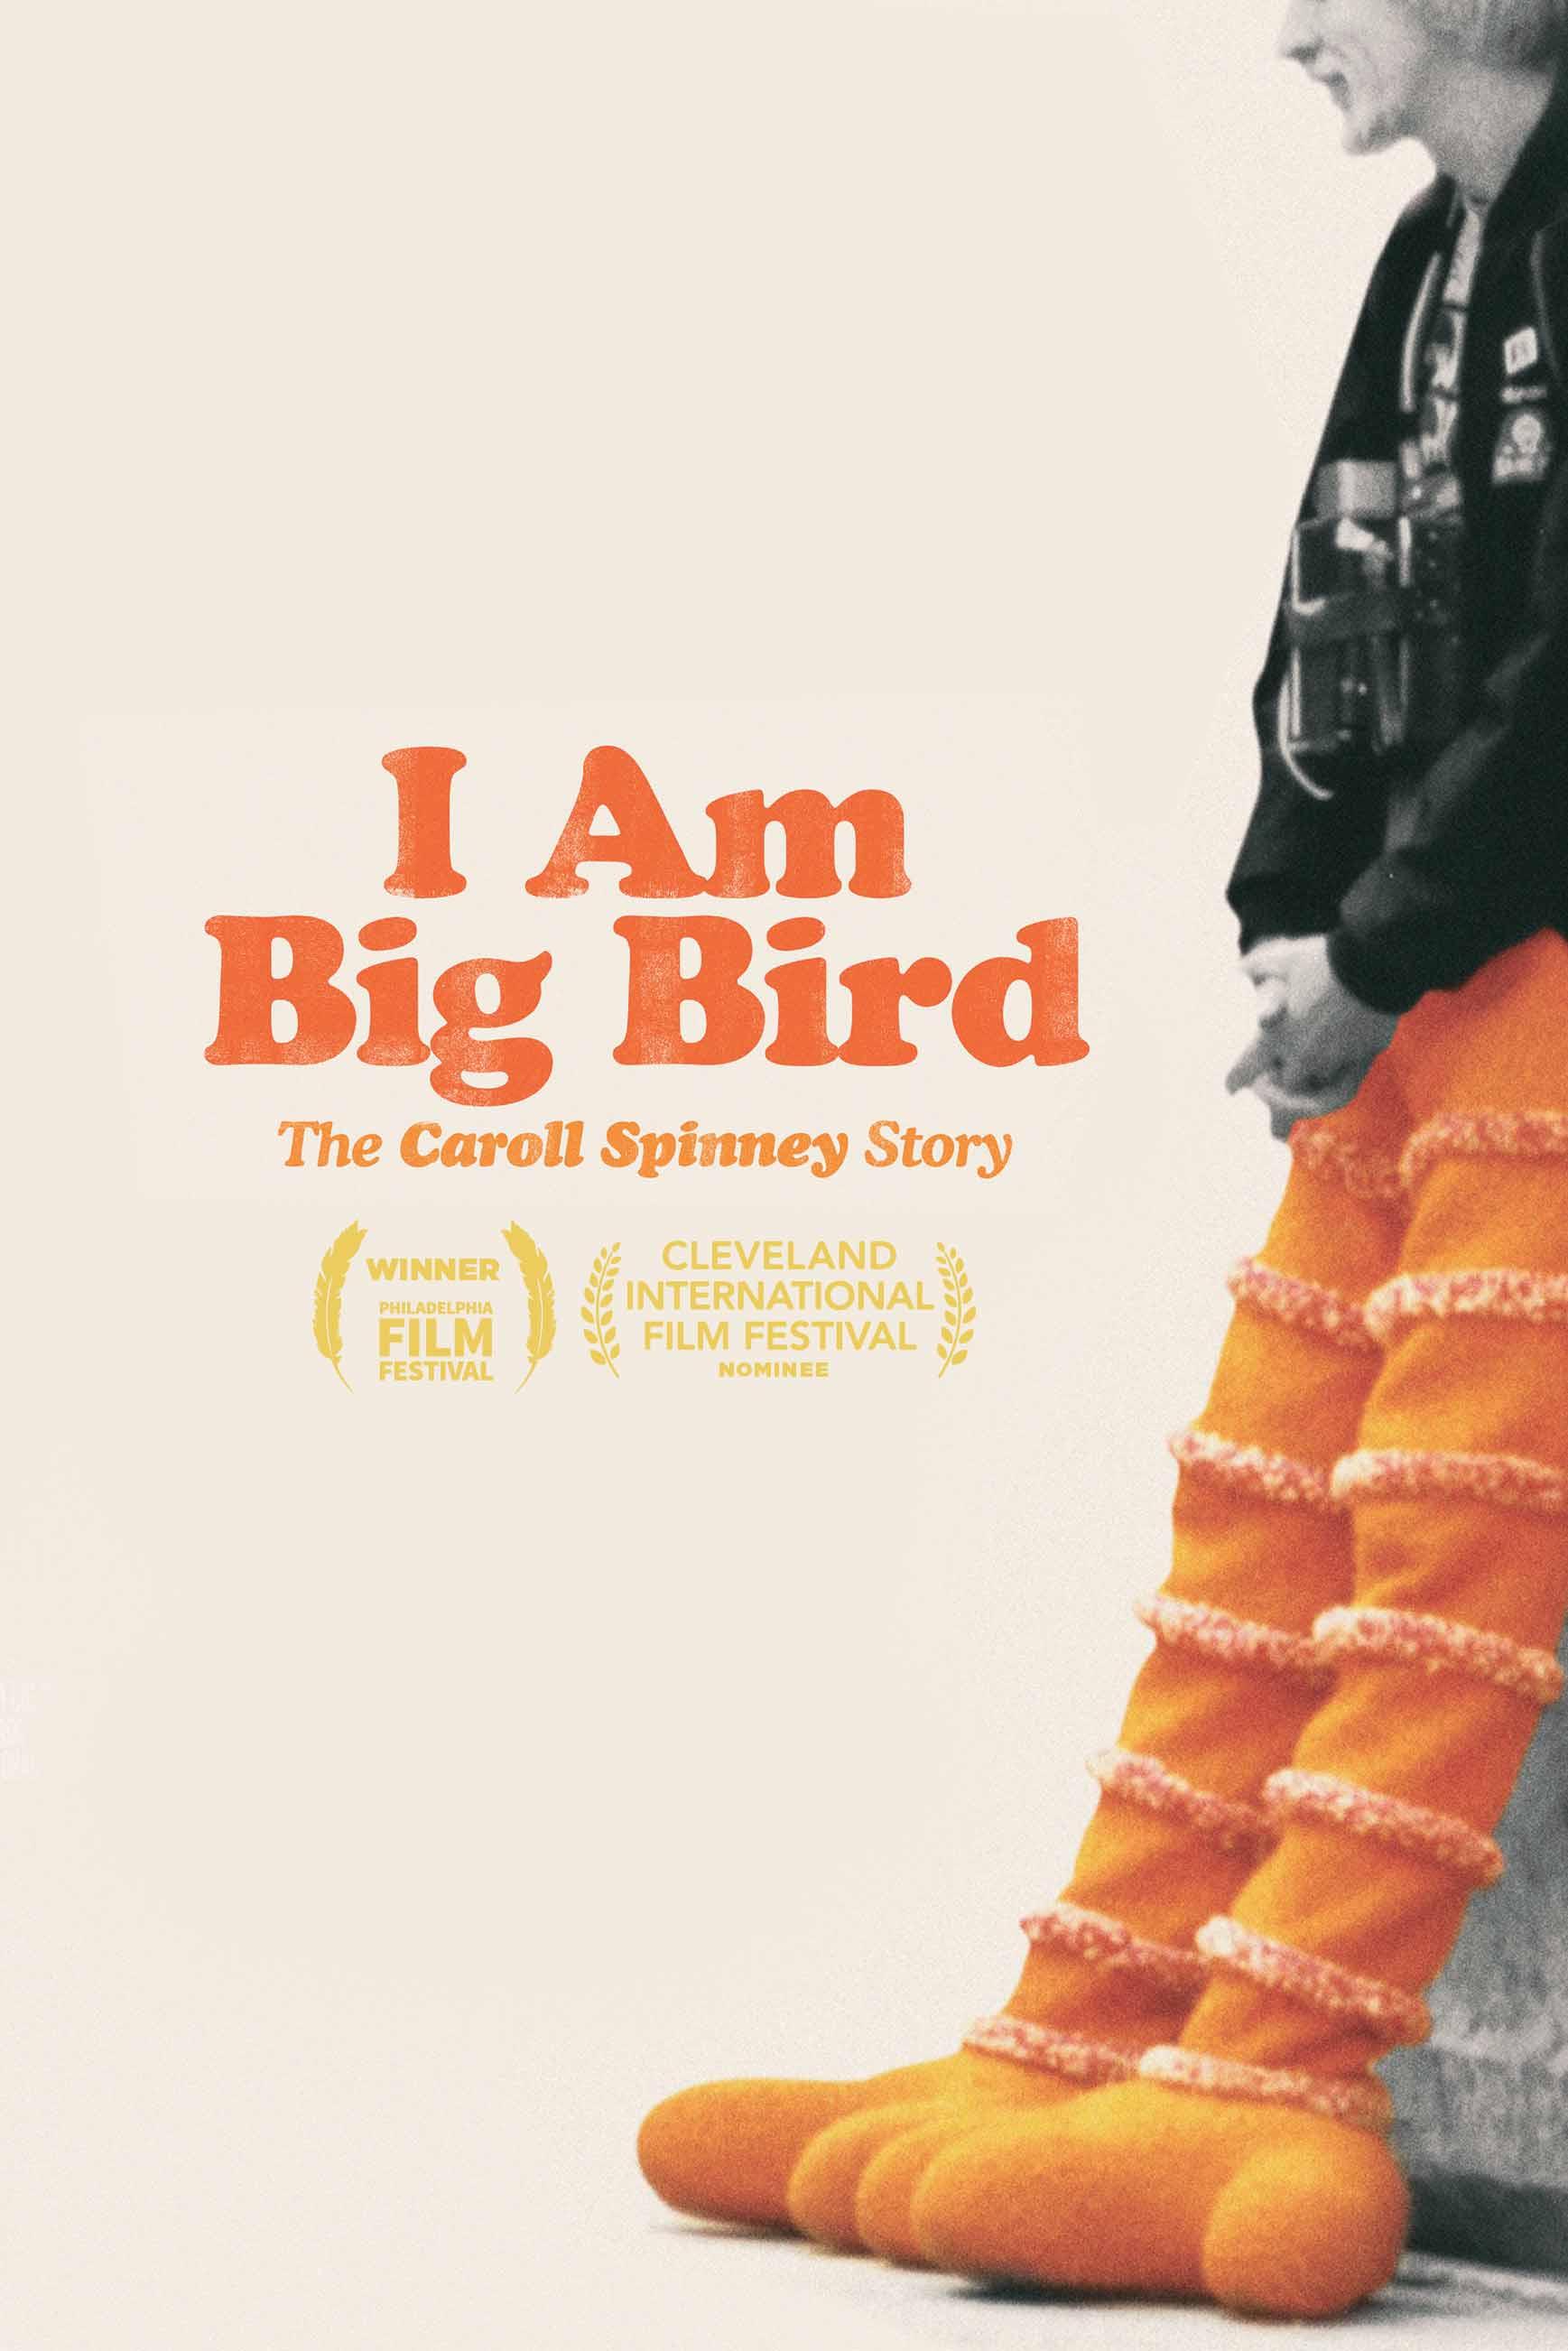 I Am Big Bird: The Caroll Spinney Story